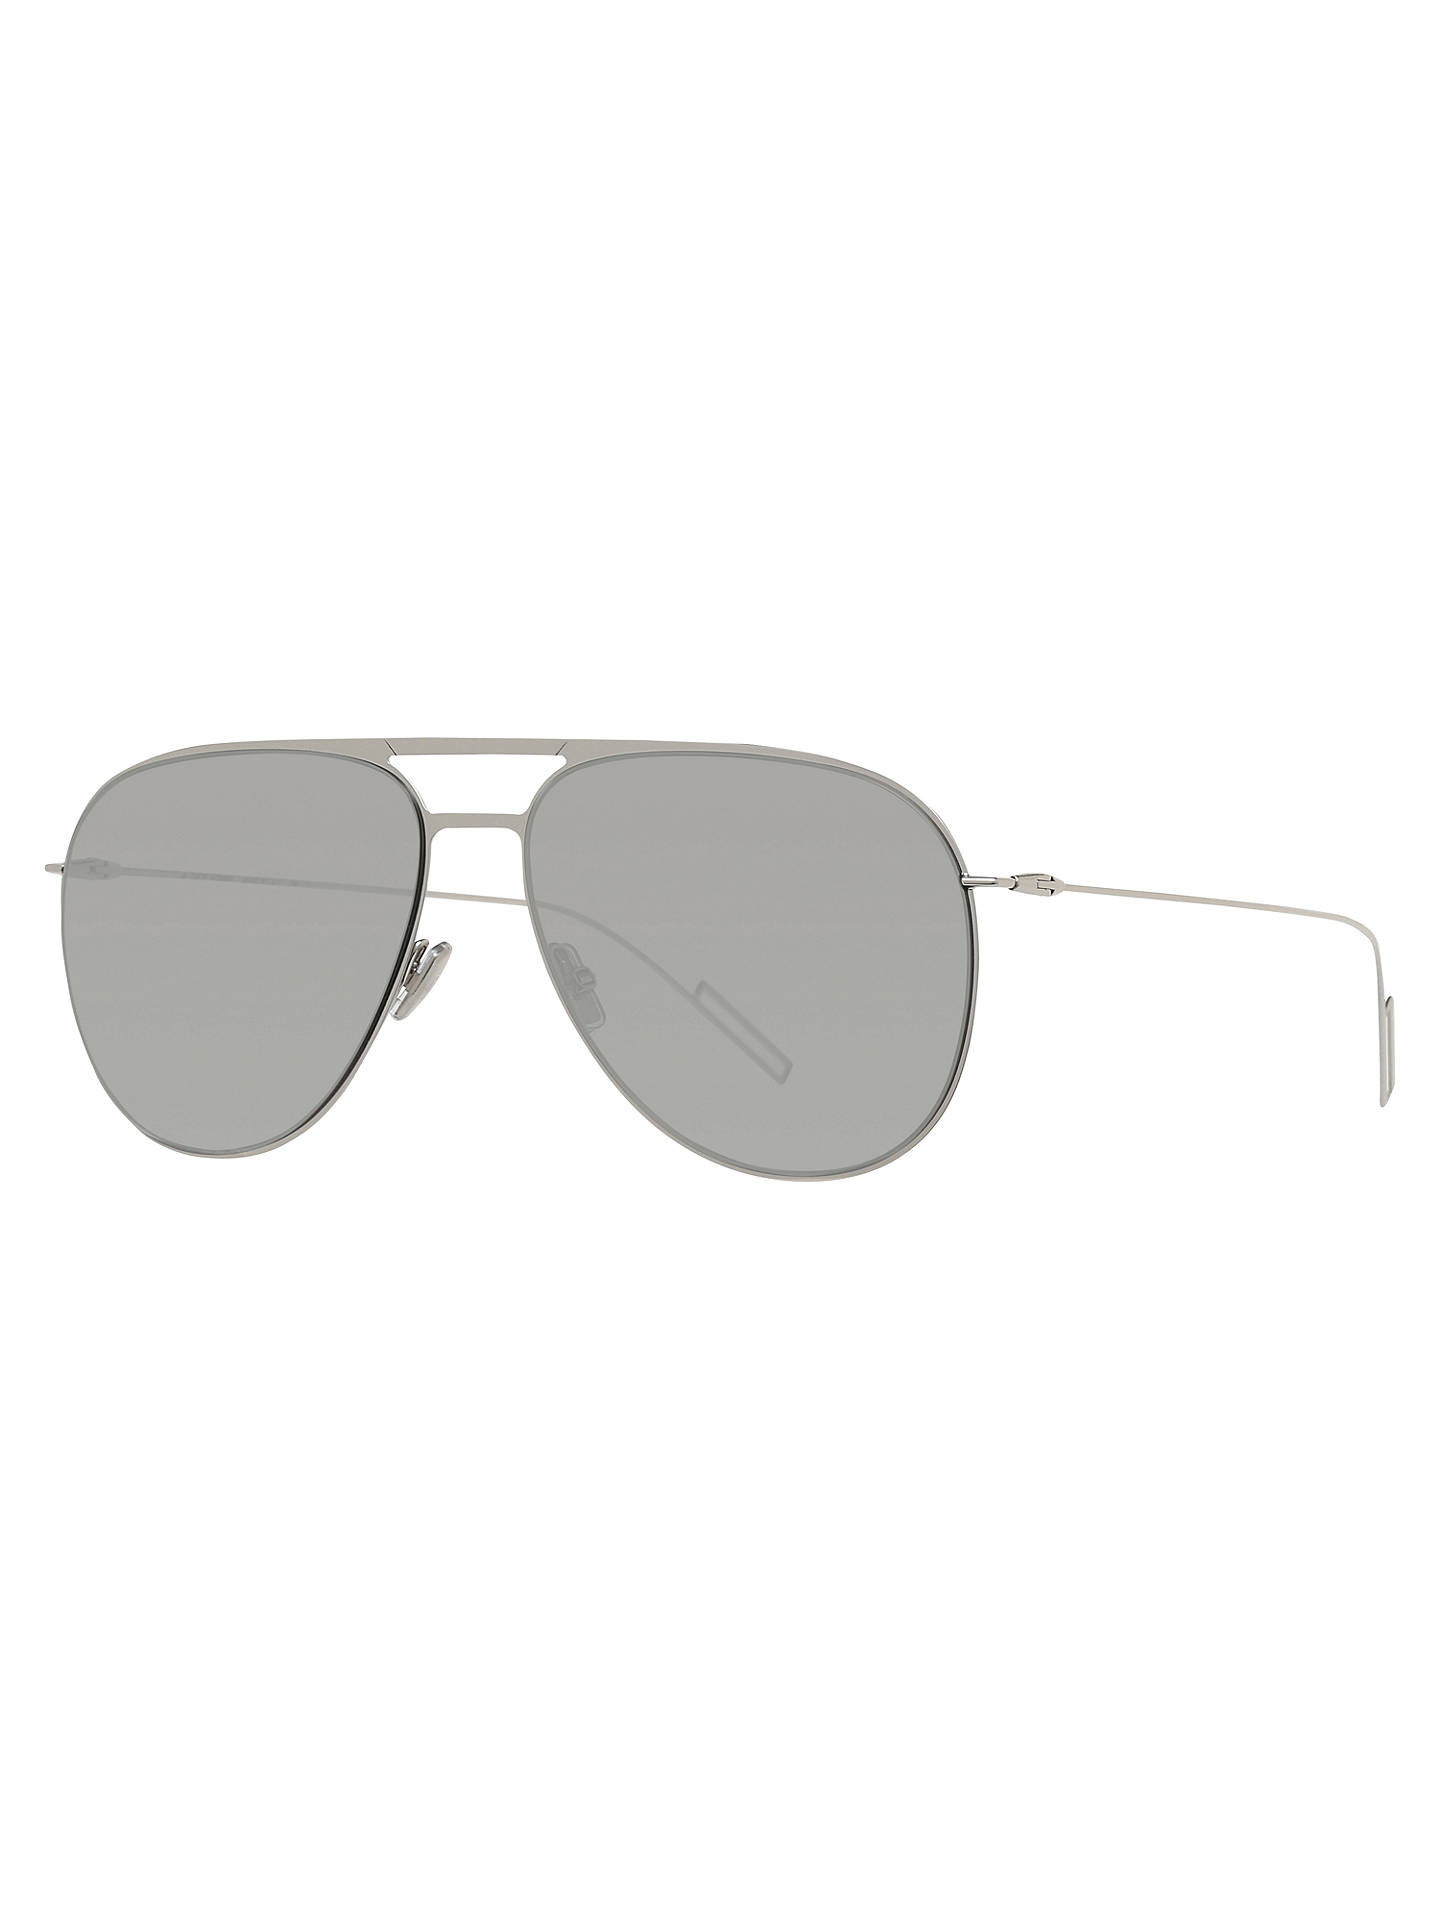 21a53c1acf45 Buy Dior Dior0205S Aviator Sunglasses, Silver/Grey Online at johnlewis.com  ...